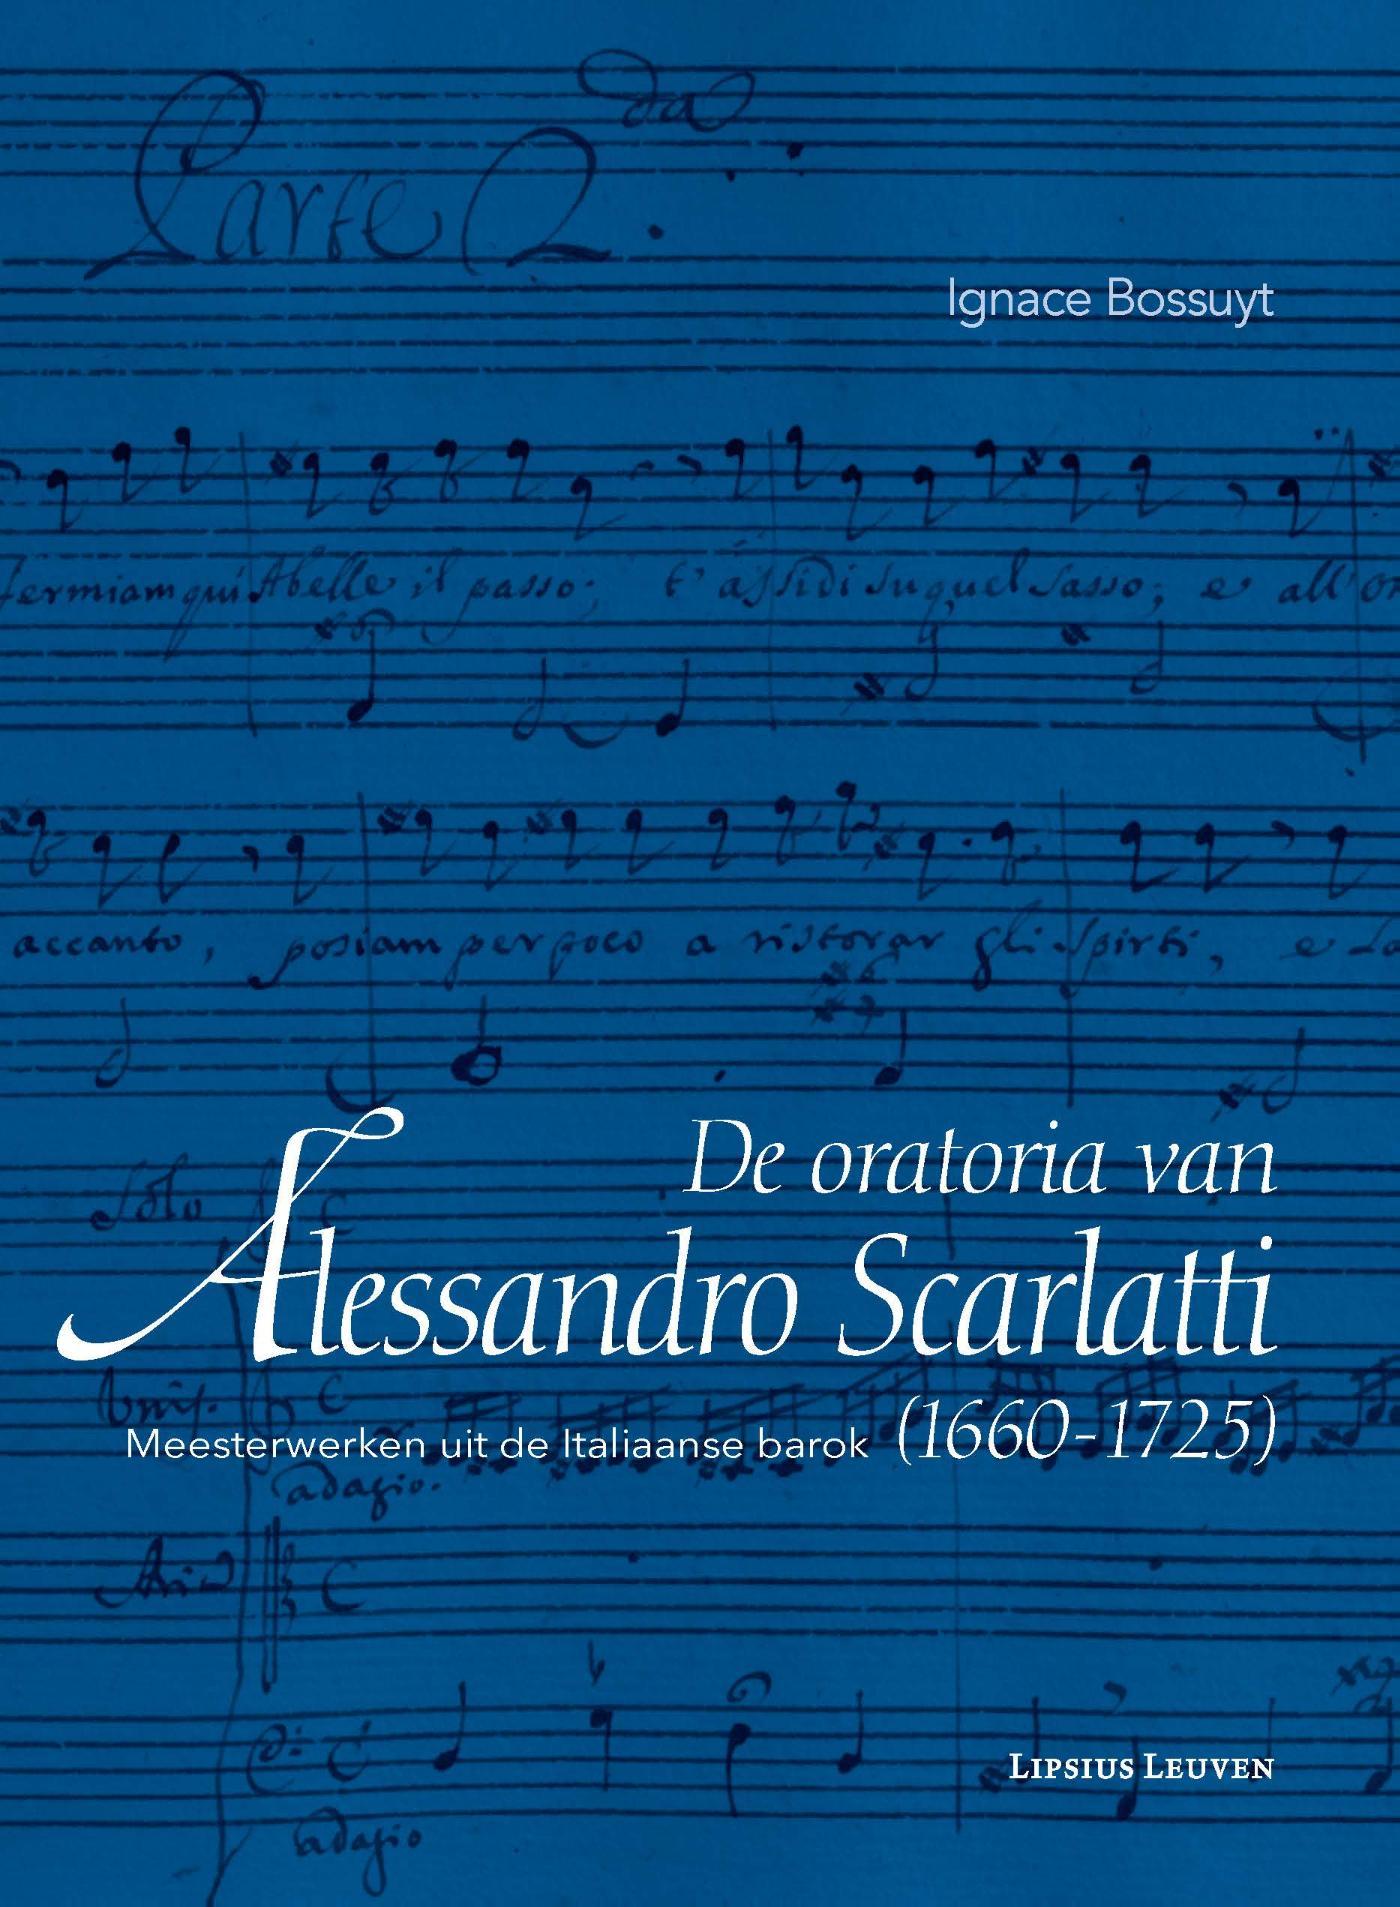 De oratoria van Alessandro Scarlatti (1660?1725)